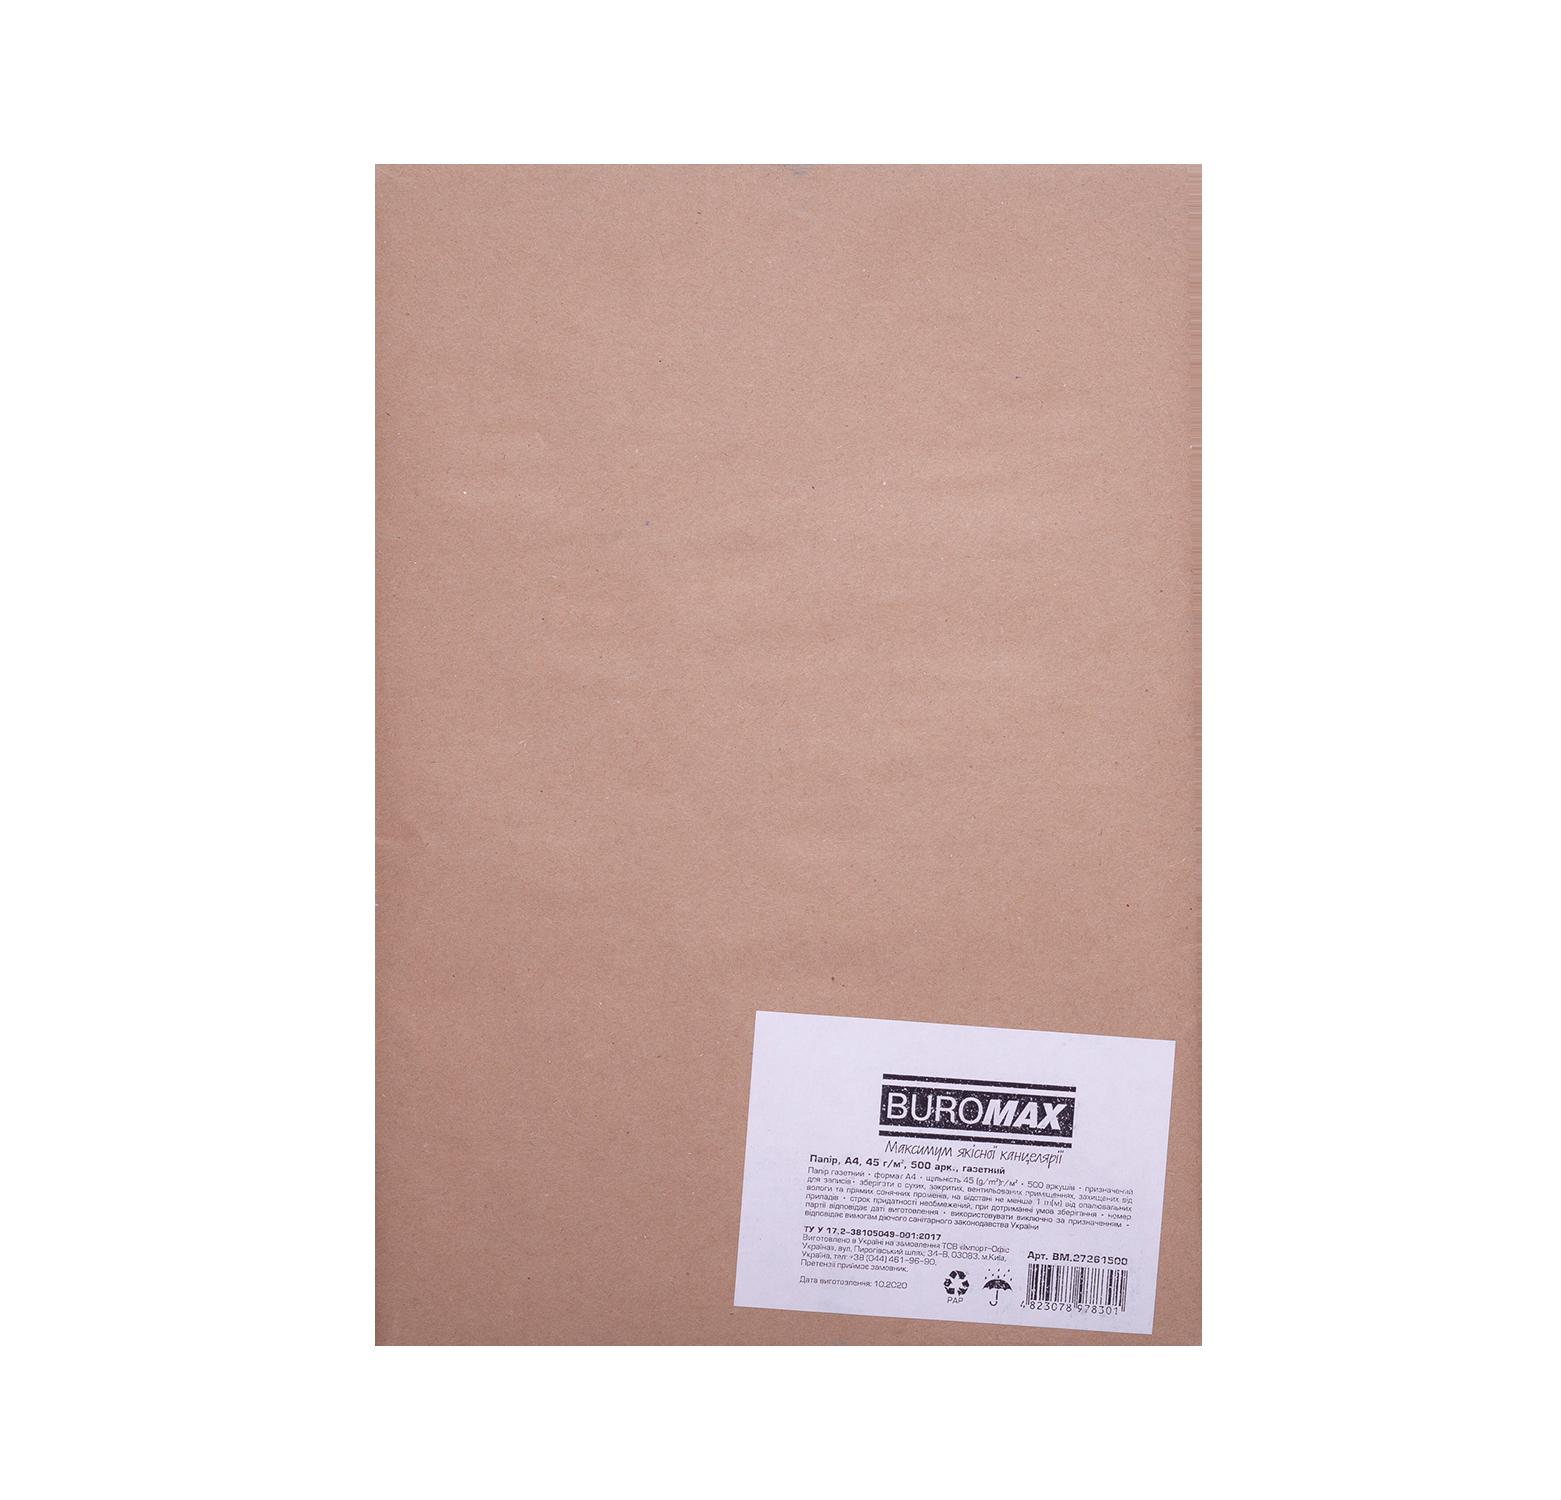 Газетная бумага BuromaxА4,45 г/м2, 250 листов